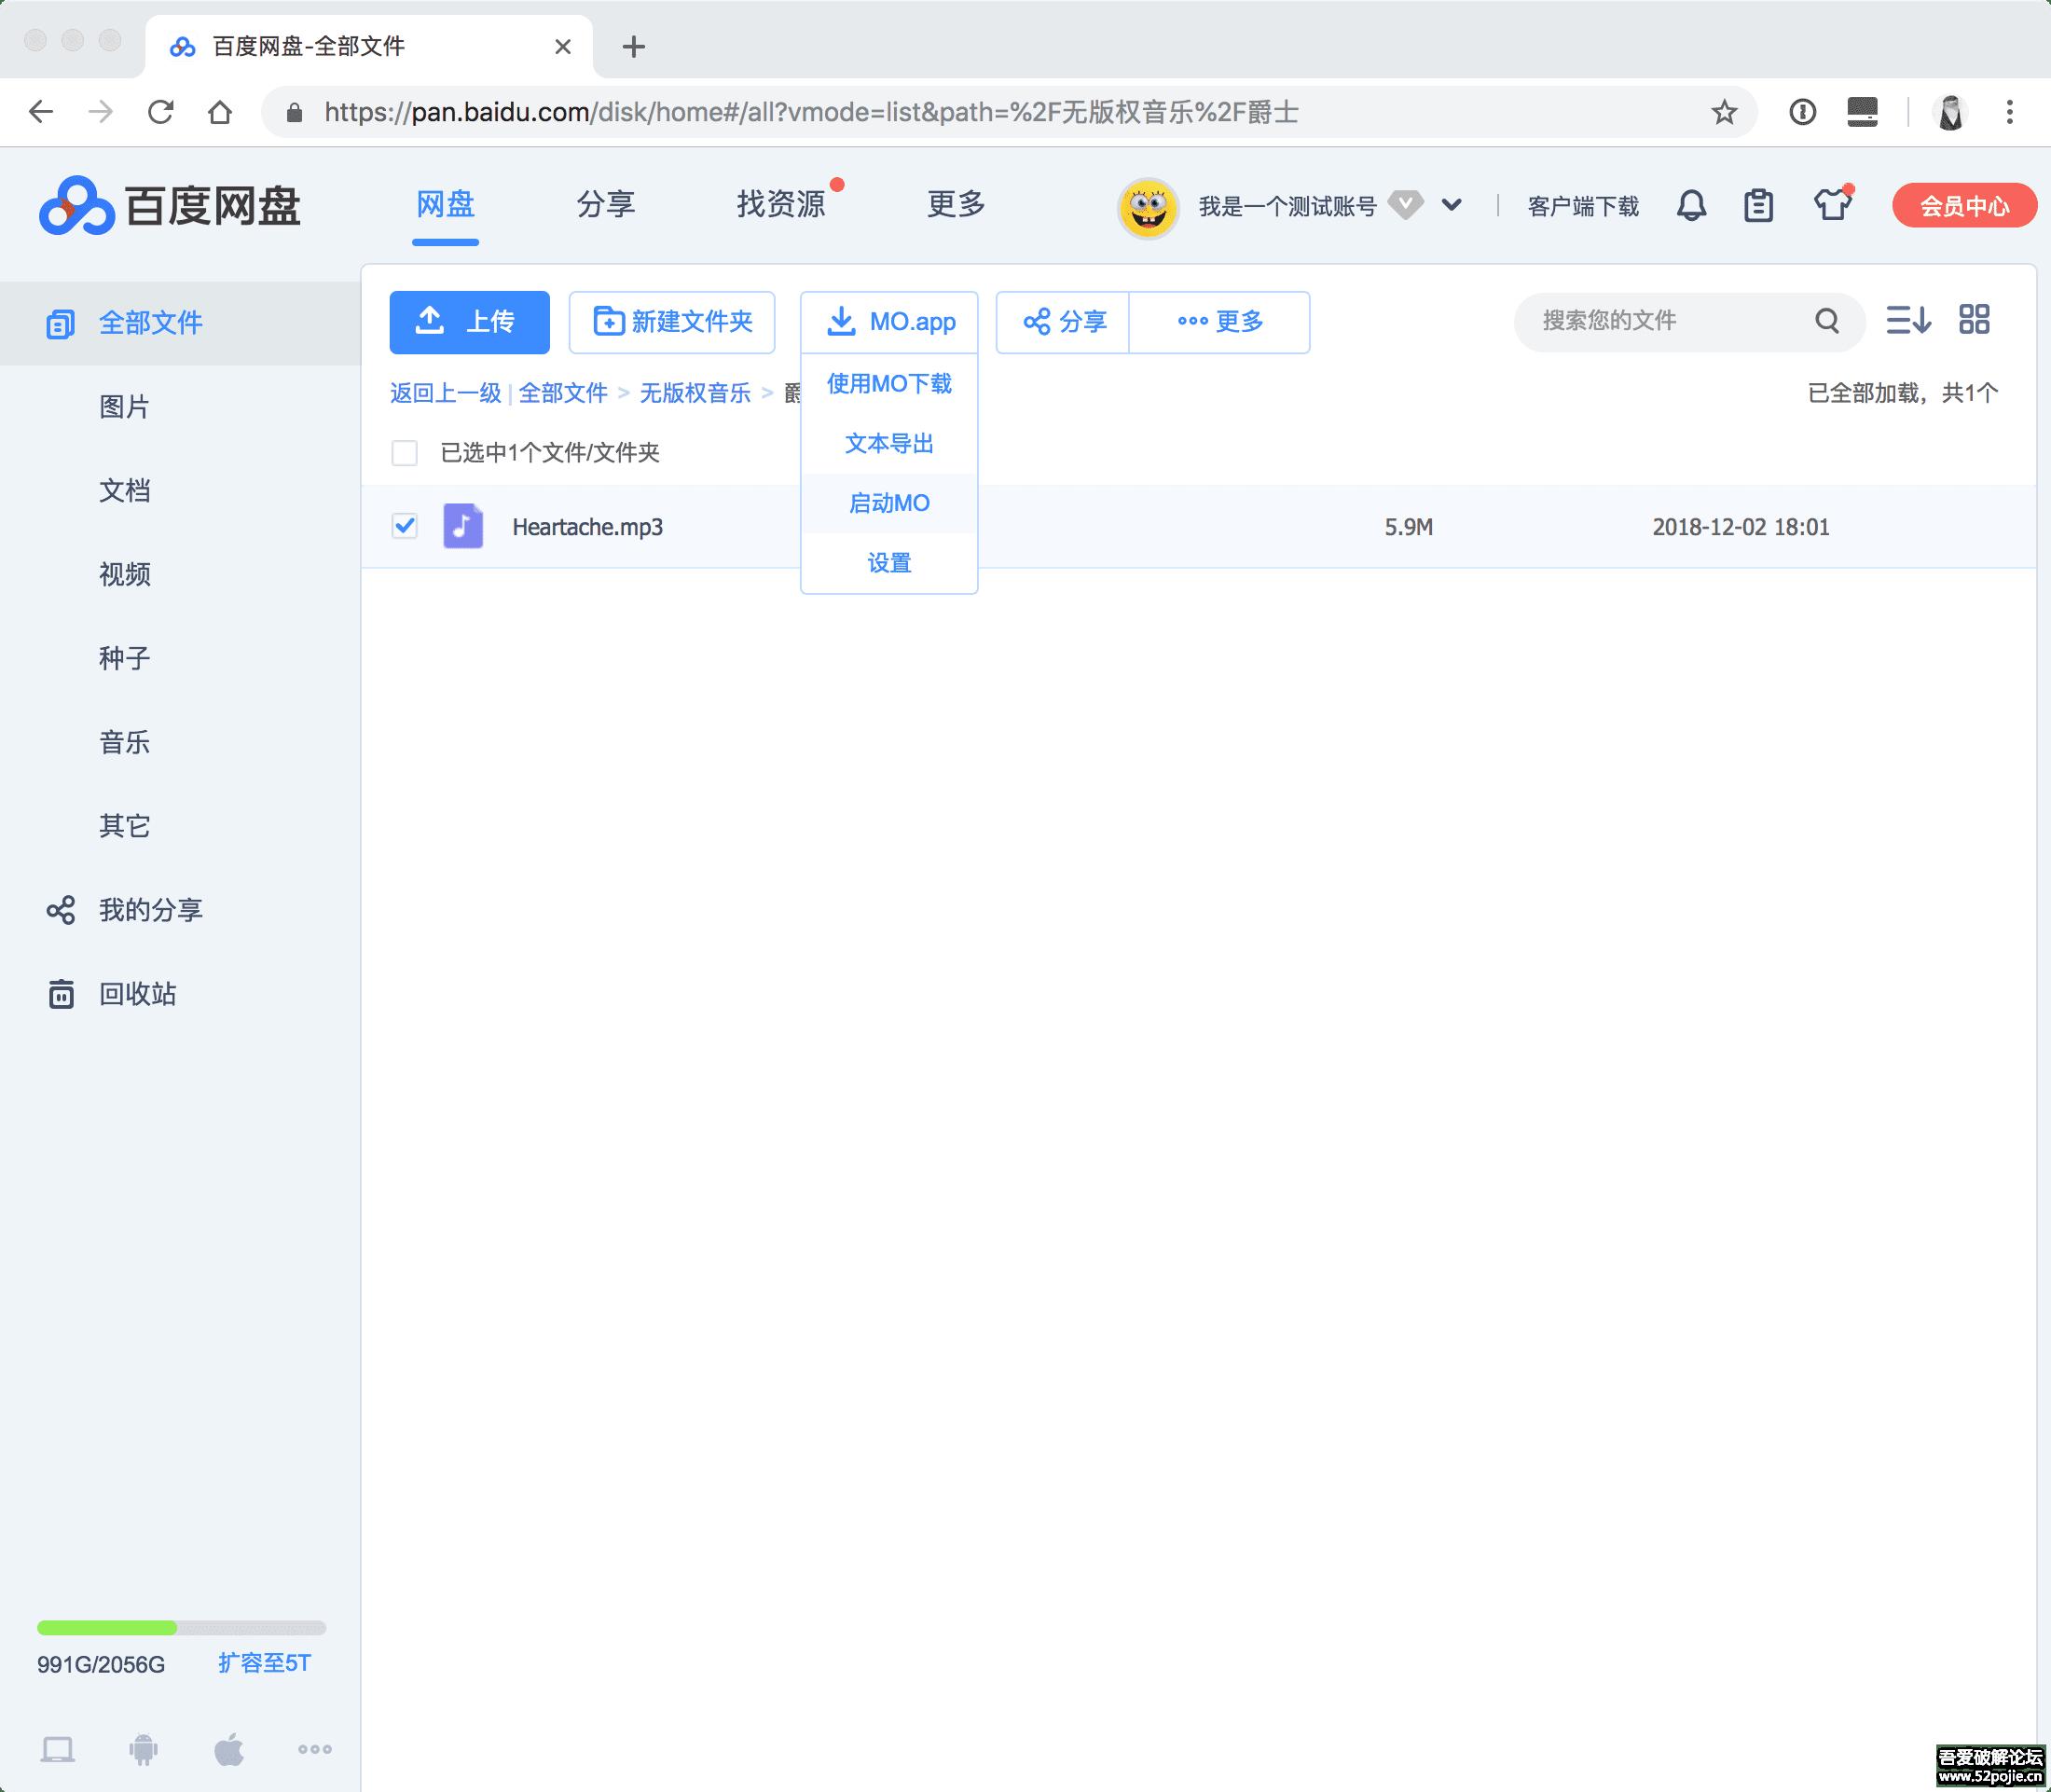 【windows】Motrix v1.4.1,又一款强大的下载工具,支持百度网盘满速! 电脑软件 第7张